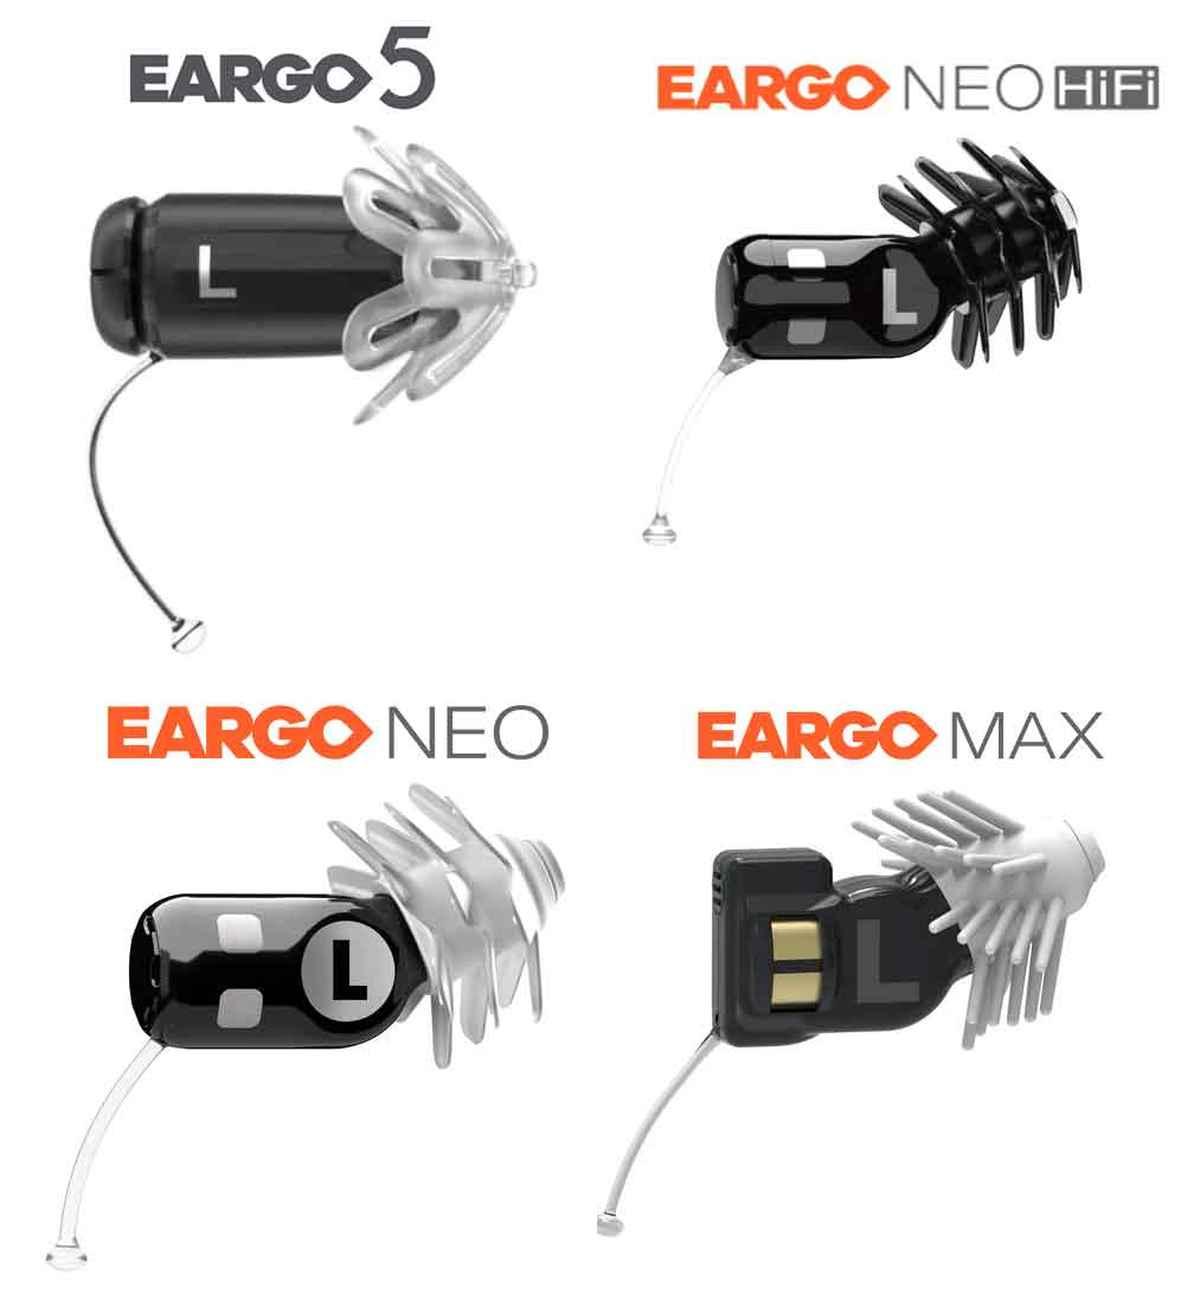 Eargo Lineup